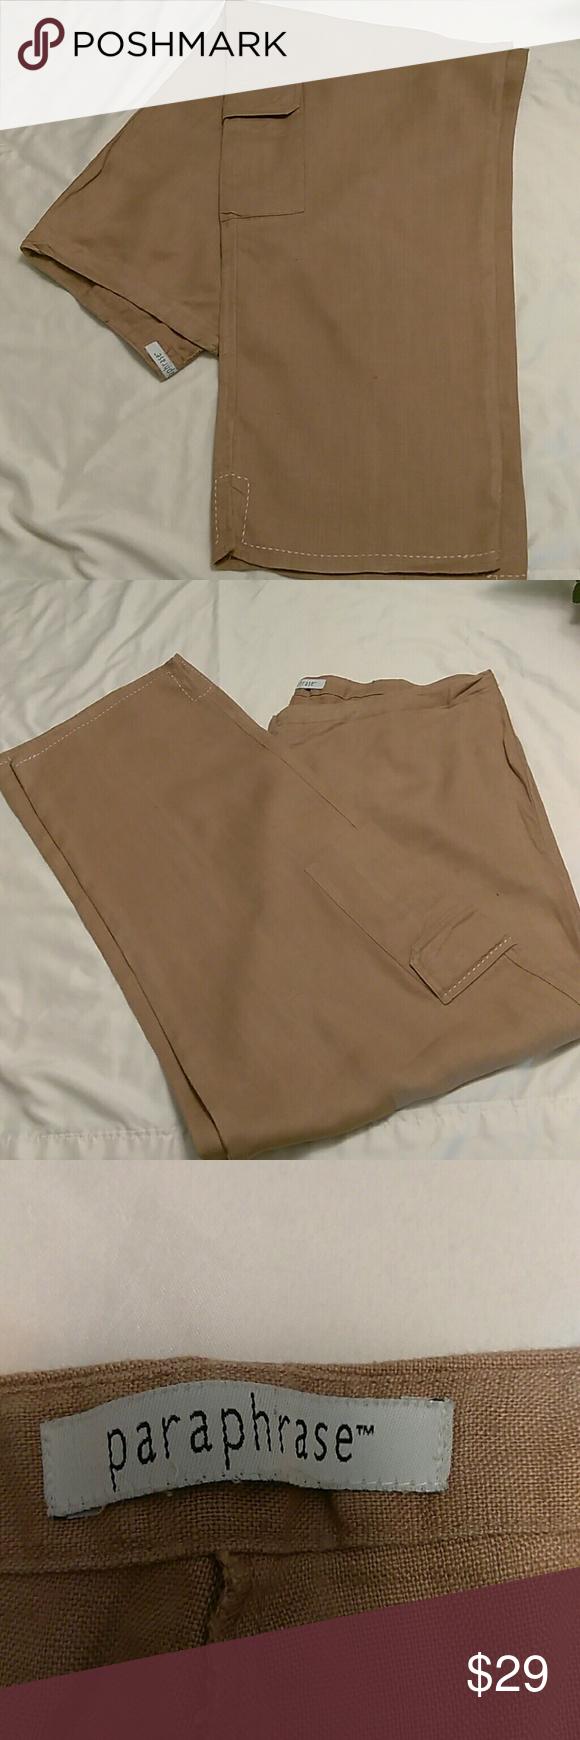 Paraphrase Ladie Linen Boho Pant Women Pants